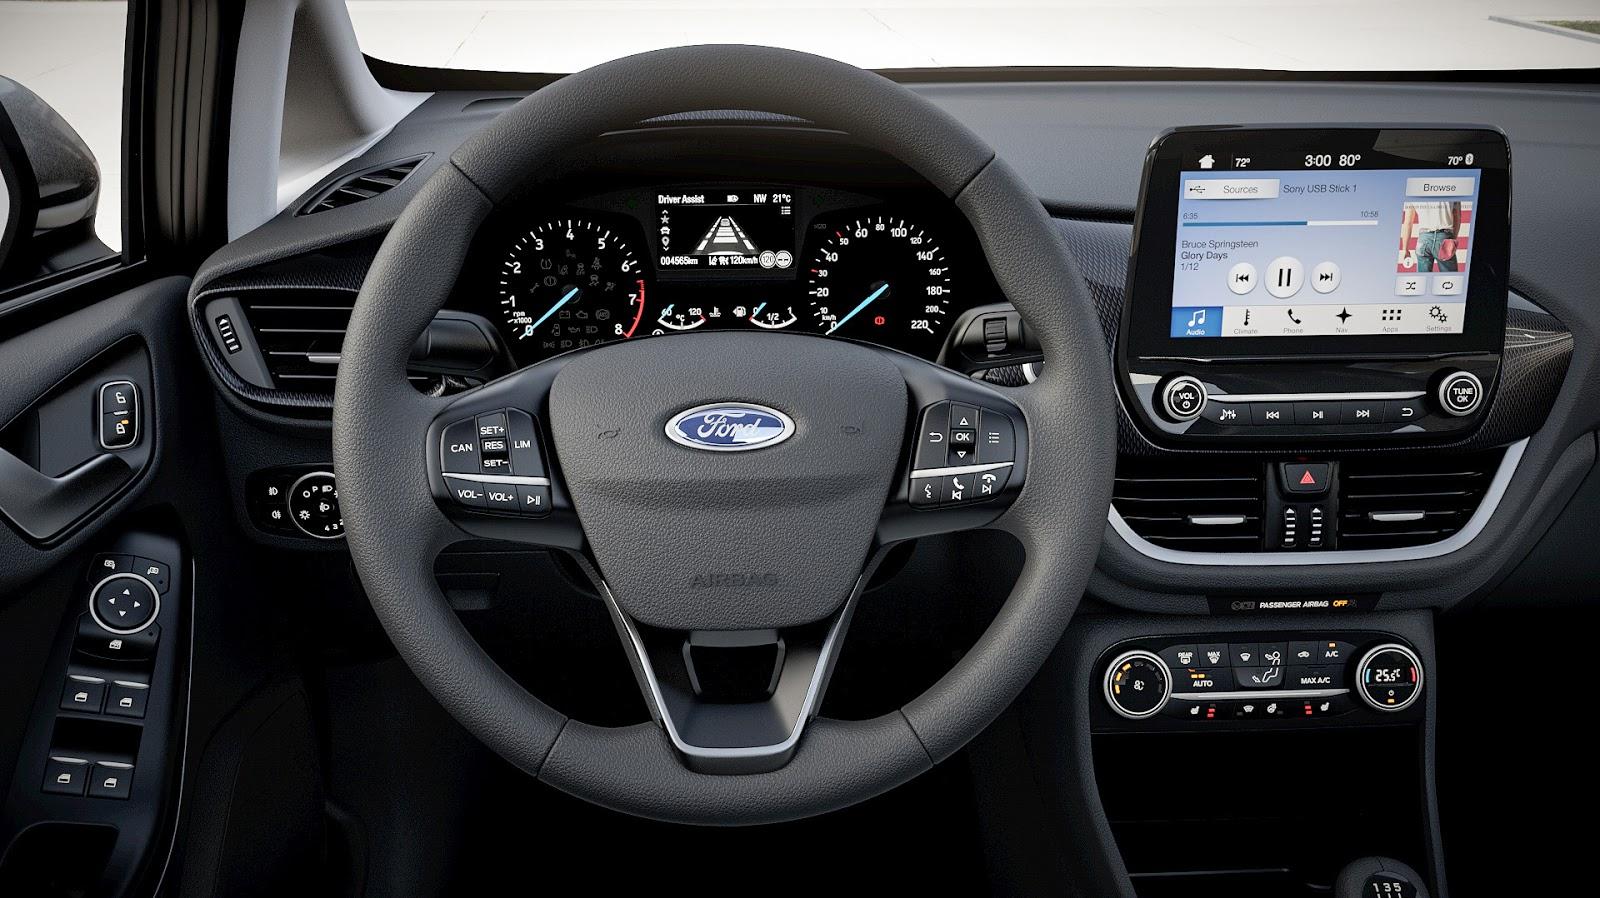 FORD FIESTA2017 InteriorDesignTour Cockpit Day Τα πρώτα Ford Fiesta έρχονται στην Ελλάδα, με τιμή από 12.990€ Bestseller, Ford, Ford Fiesta, supermini, Λανσάρισμα